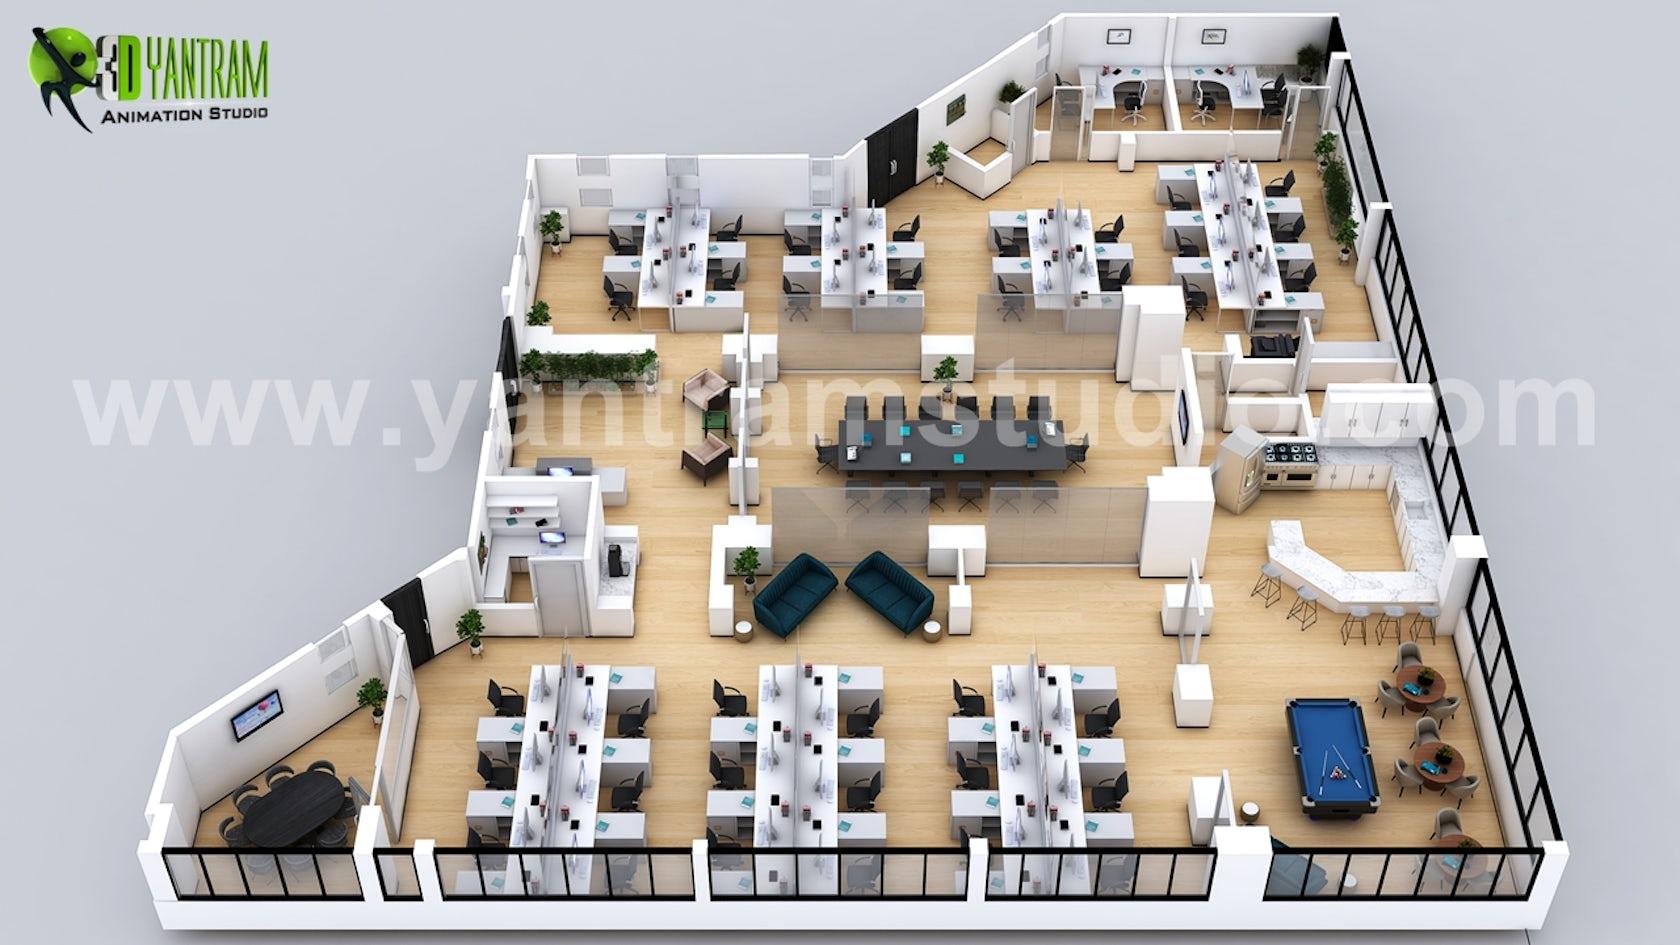 3d office virtual floor plan design ideas by yantram architectural design studio architizer. Black Bedroom Furniture Sets. Home Design Ideas